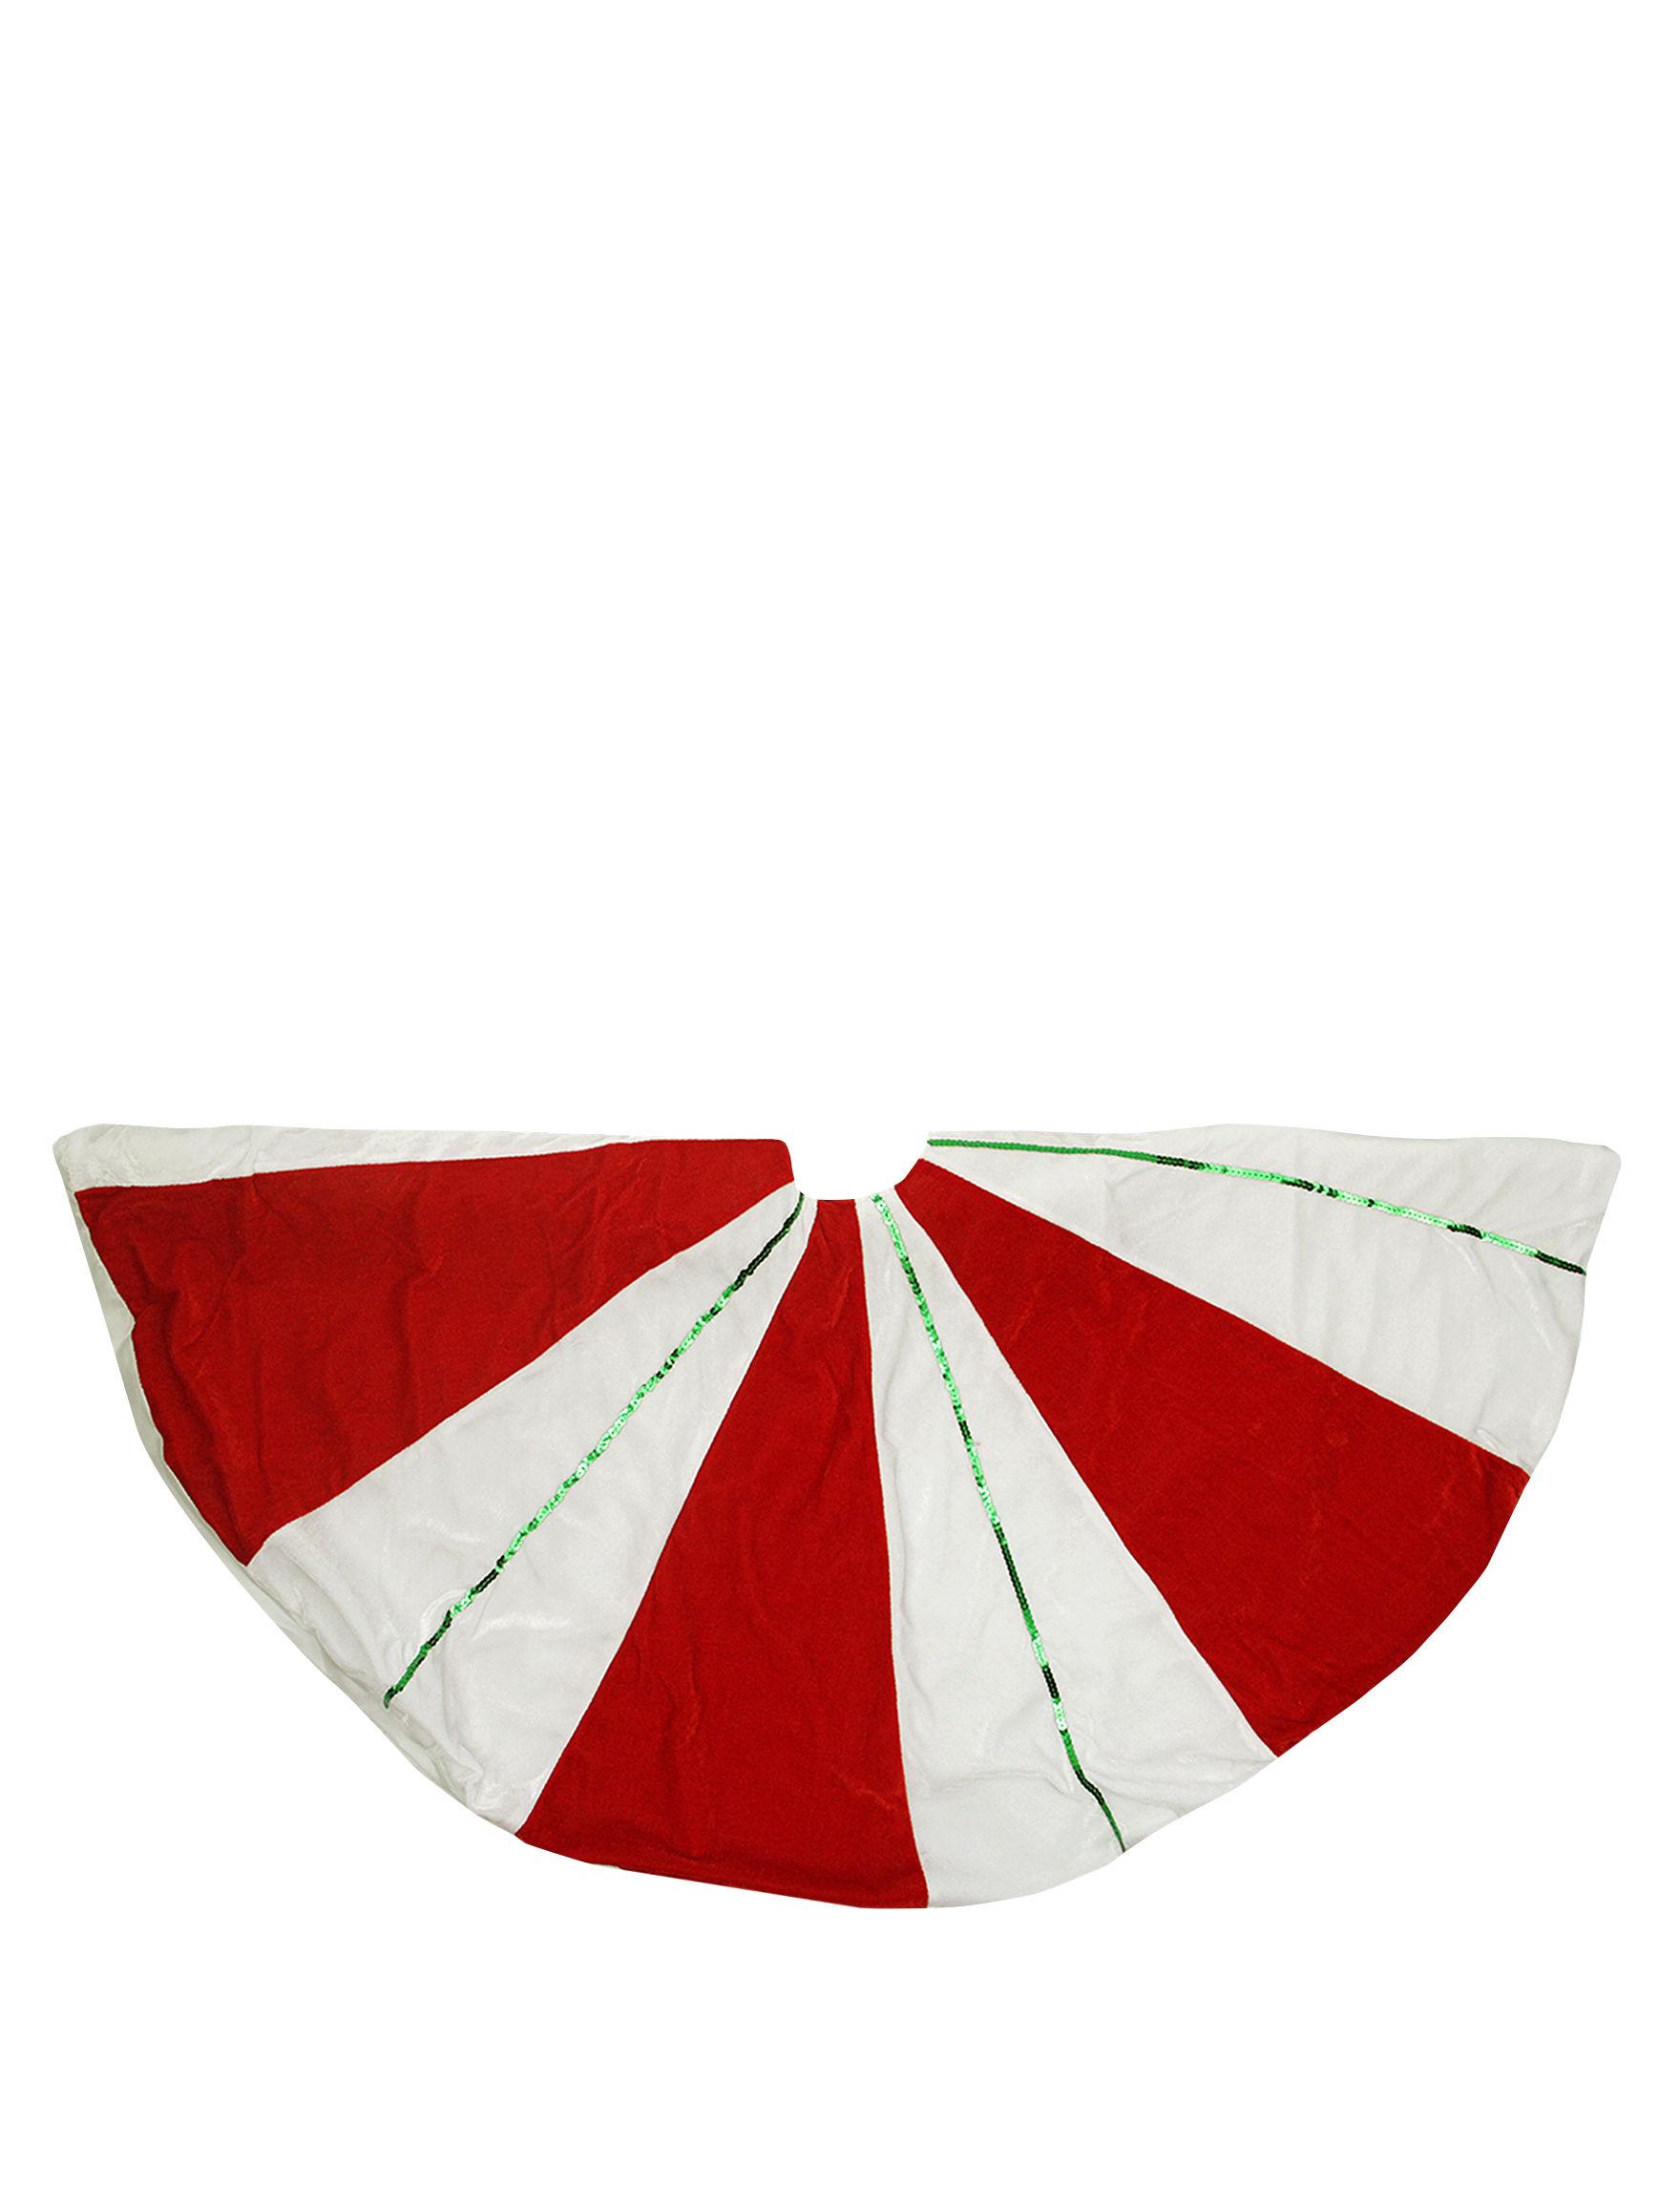 Christmas Central Multi Stockings & Tree Skirts Holiday Decor